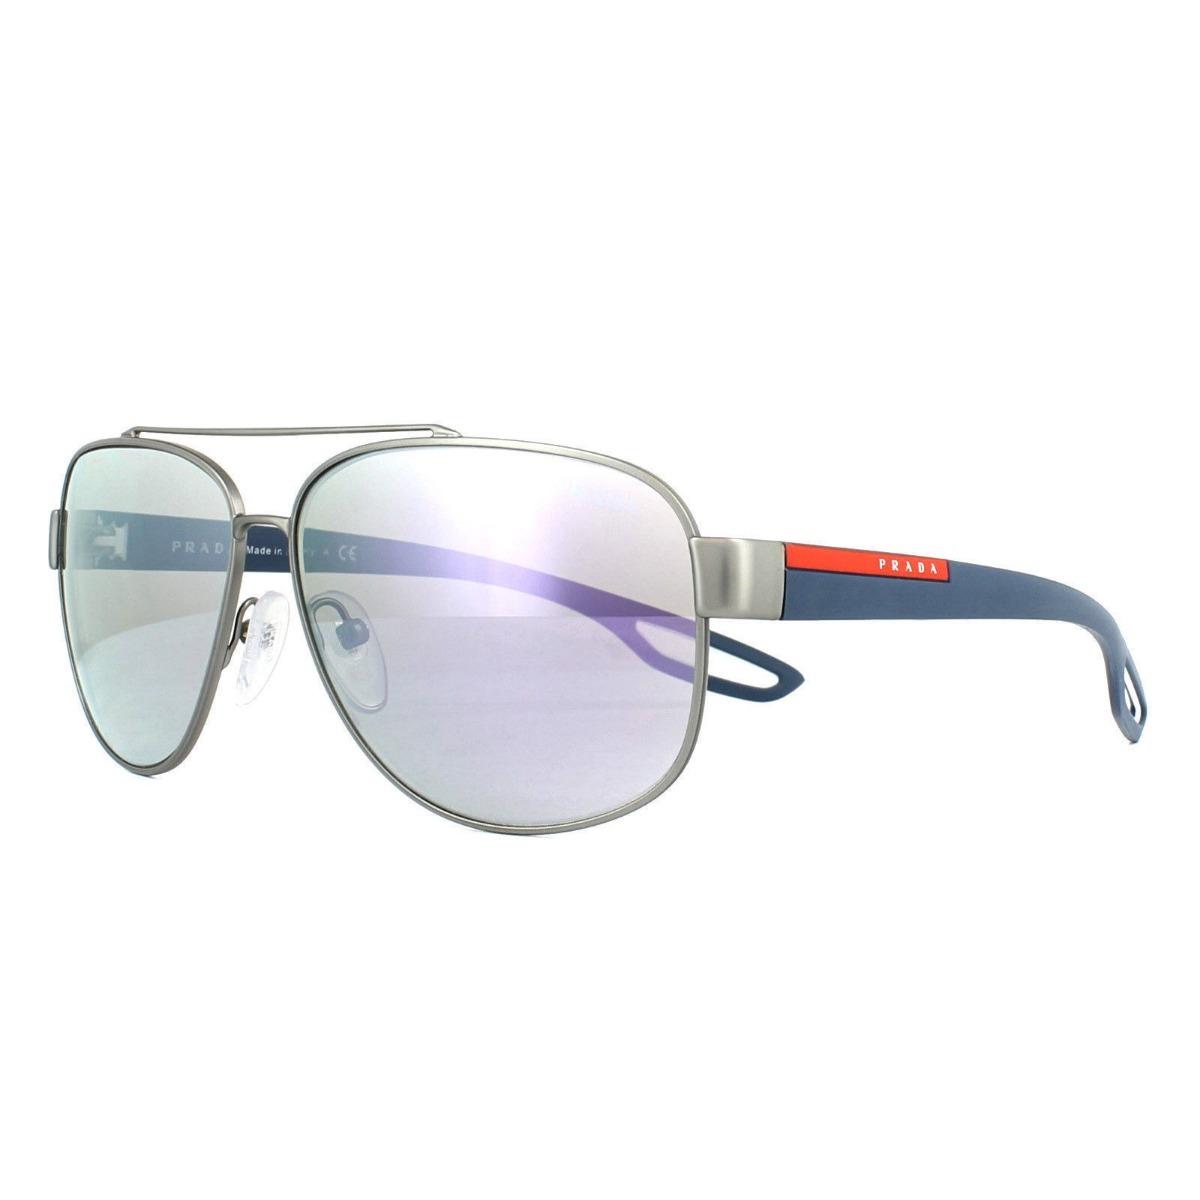 e42a9fabdd lentes gafas de sol prada sport ps58qs caucho made in italy. Cargando zoom.